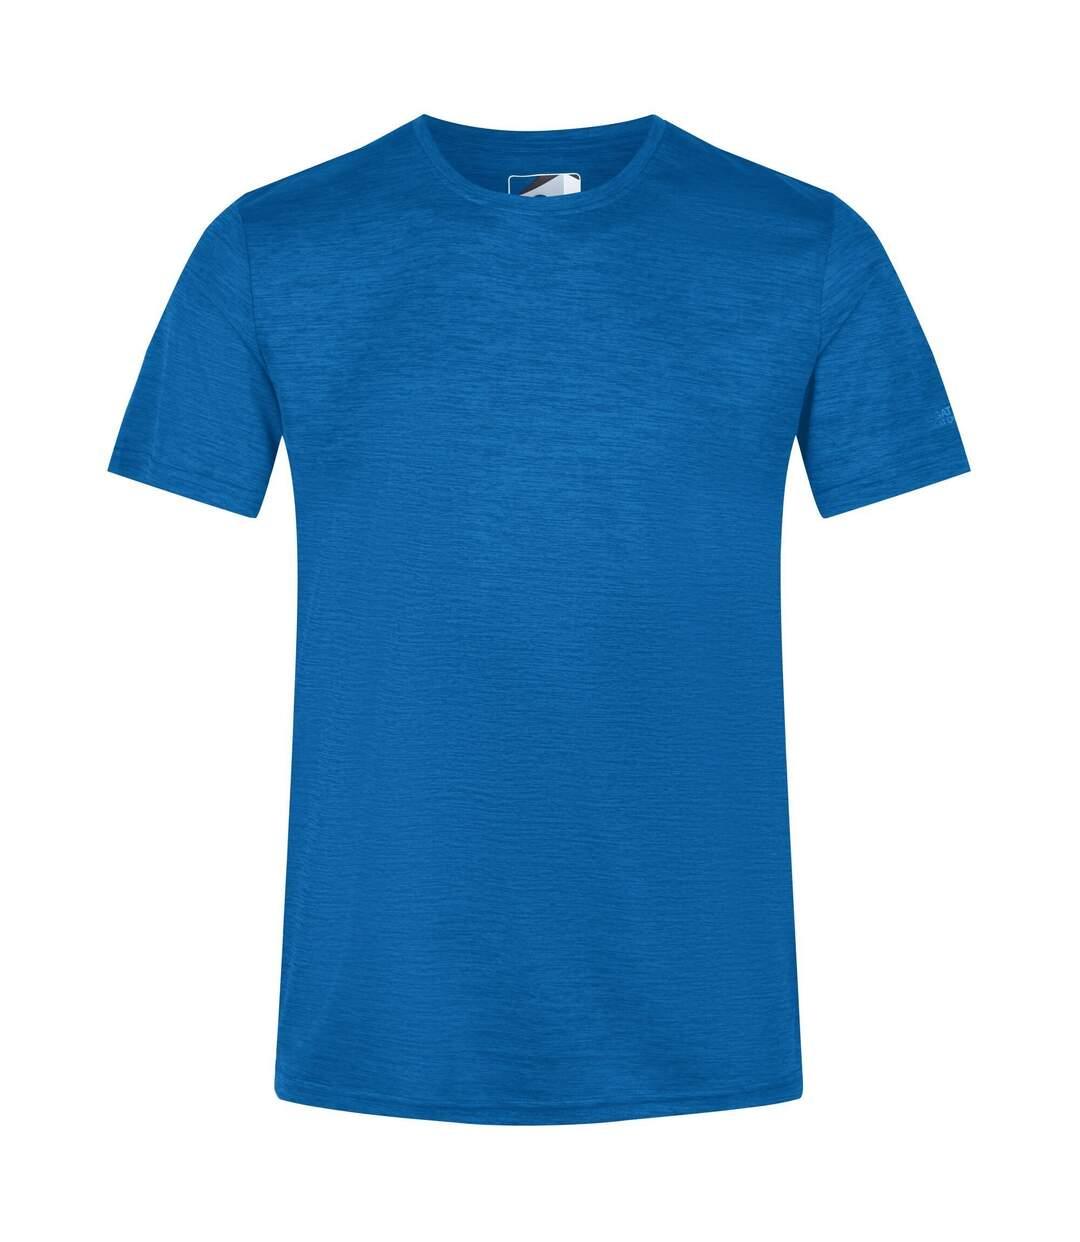 Regatta Mens Fingal Edition Marl T-Shirt (Nautical Blue Marl) - UTRG5795